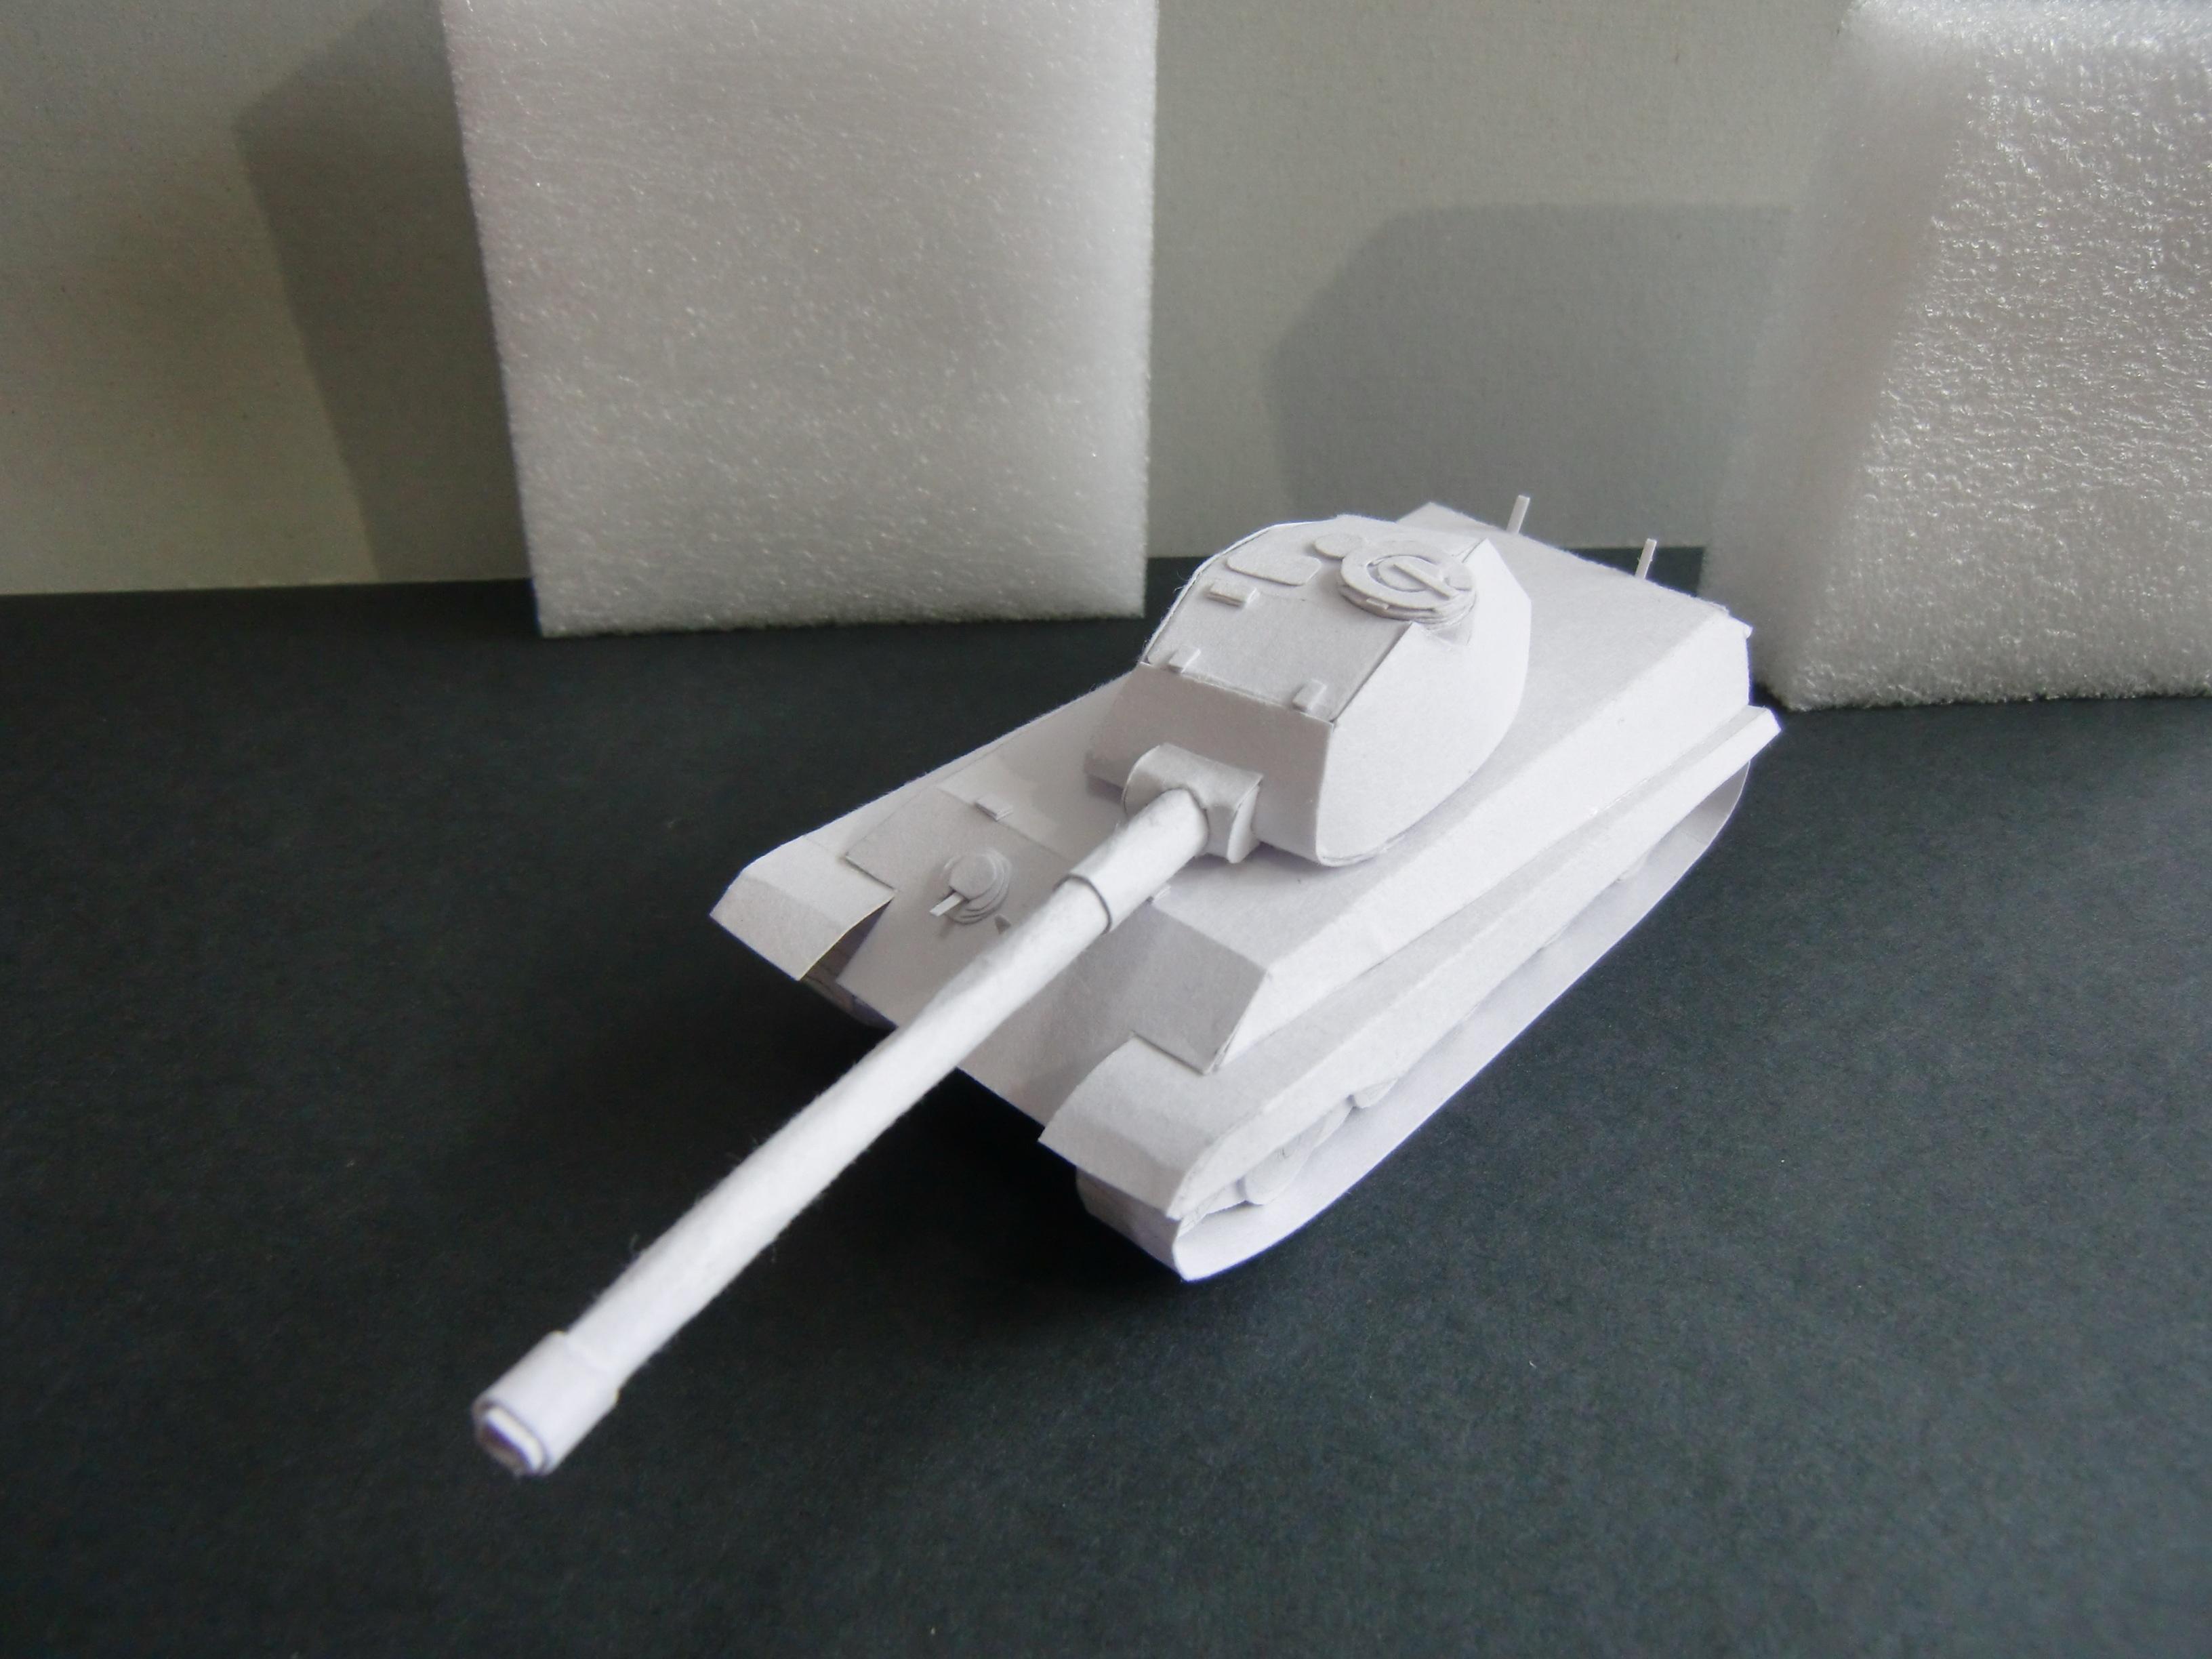 Fan Art Spotlight 52 General News World Of Tanks